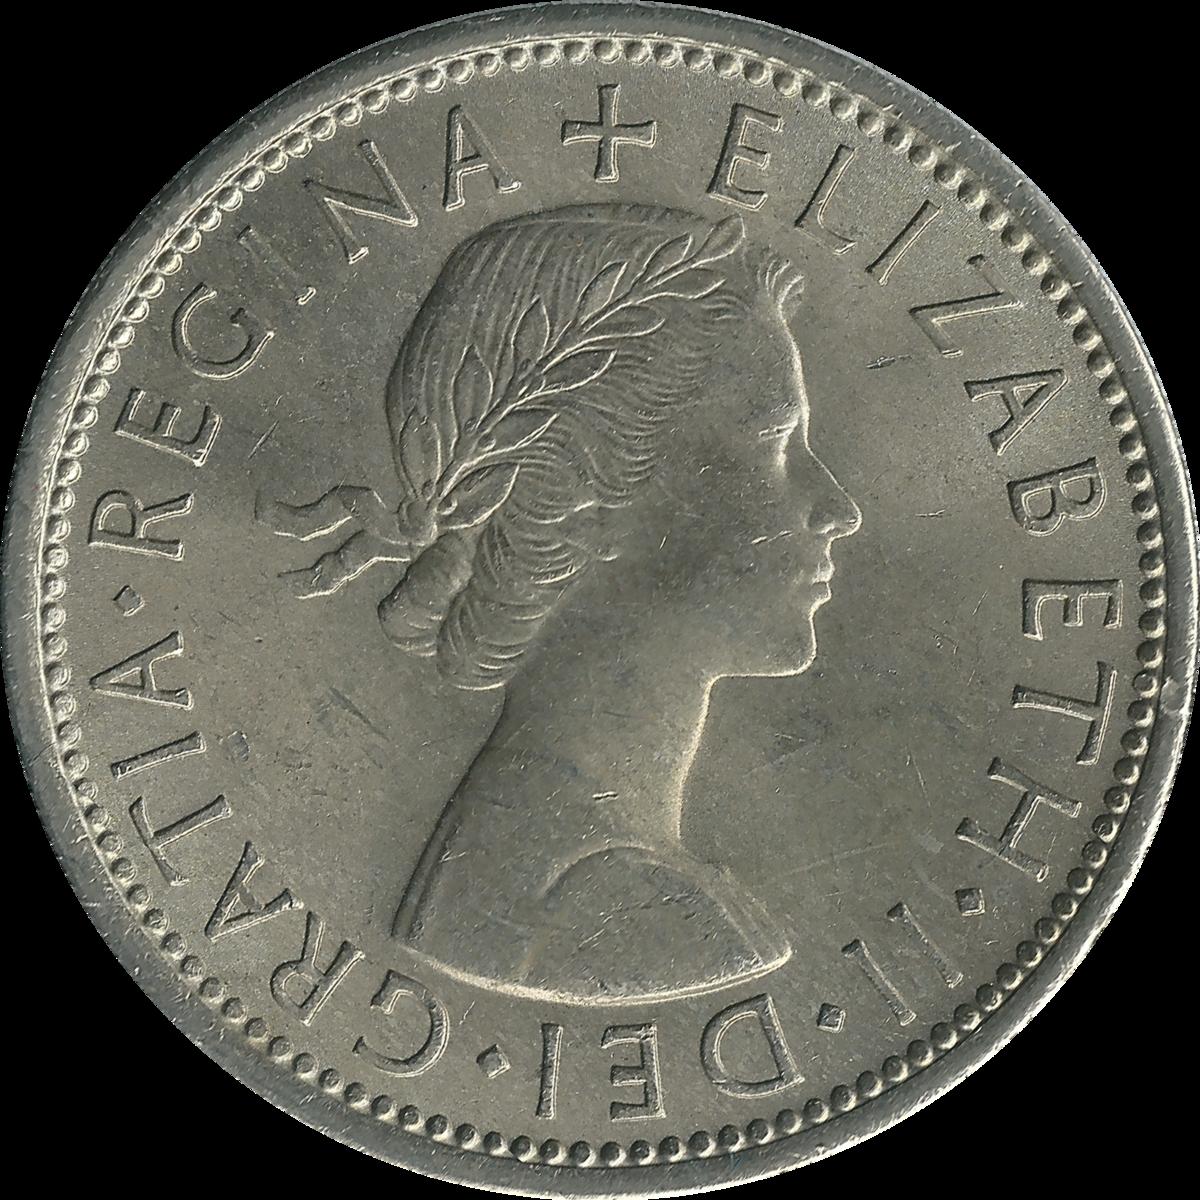 Florin (British coin).